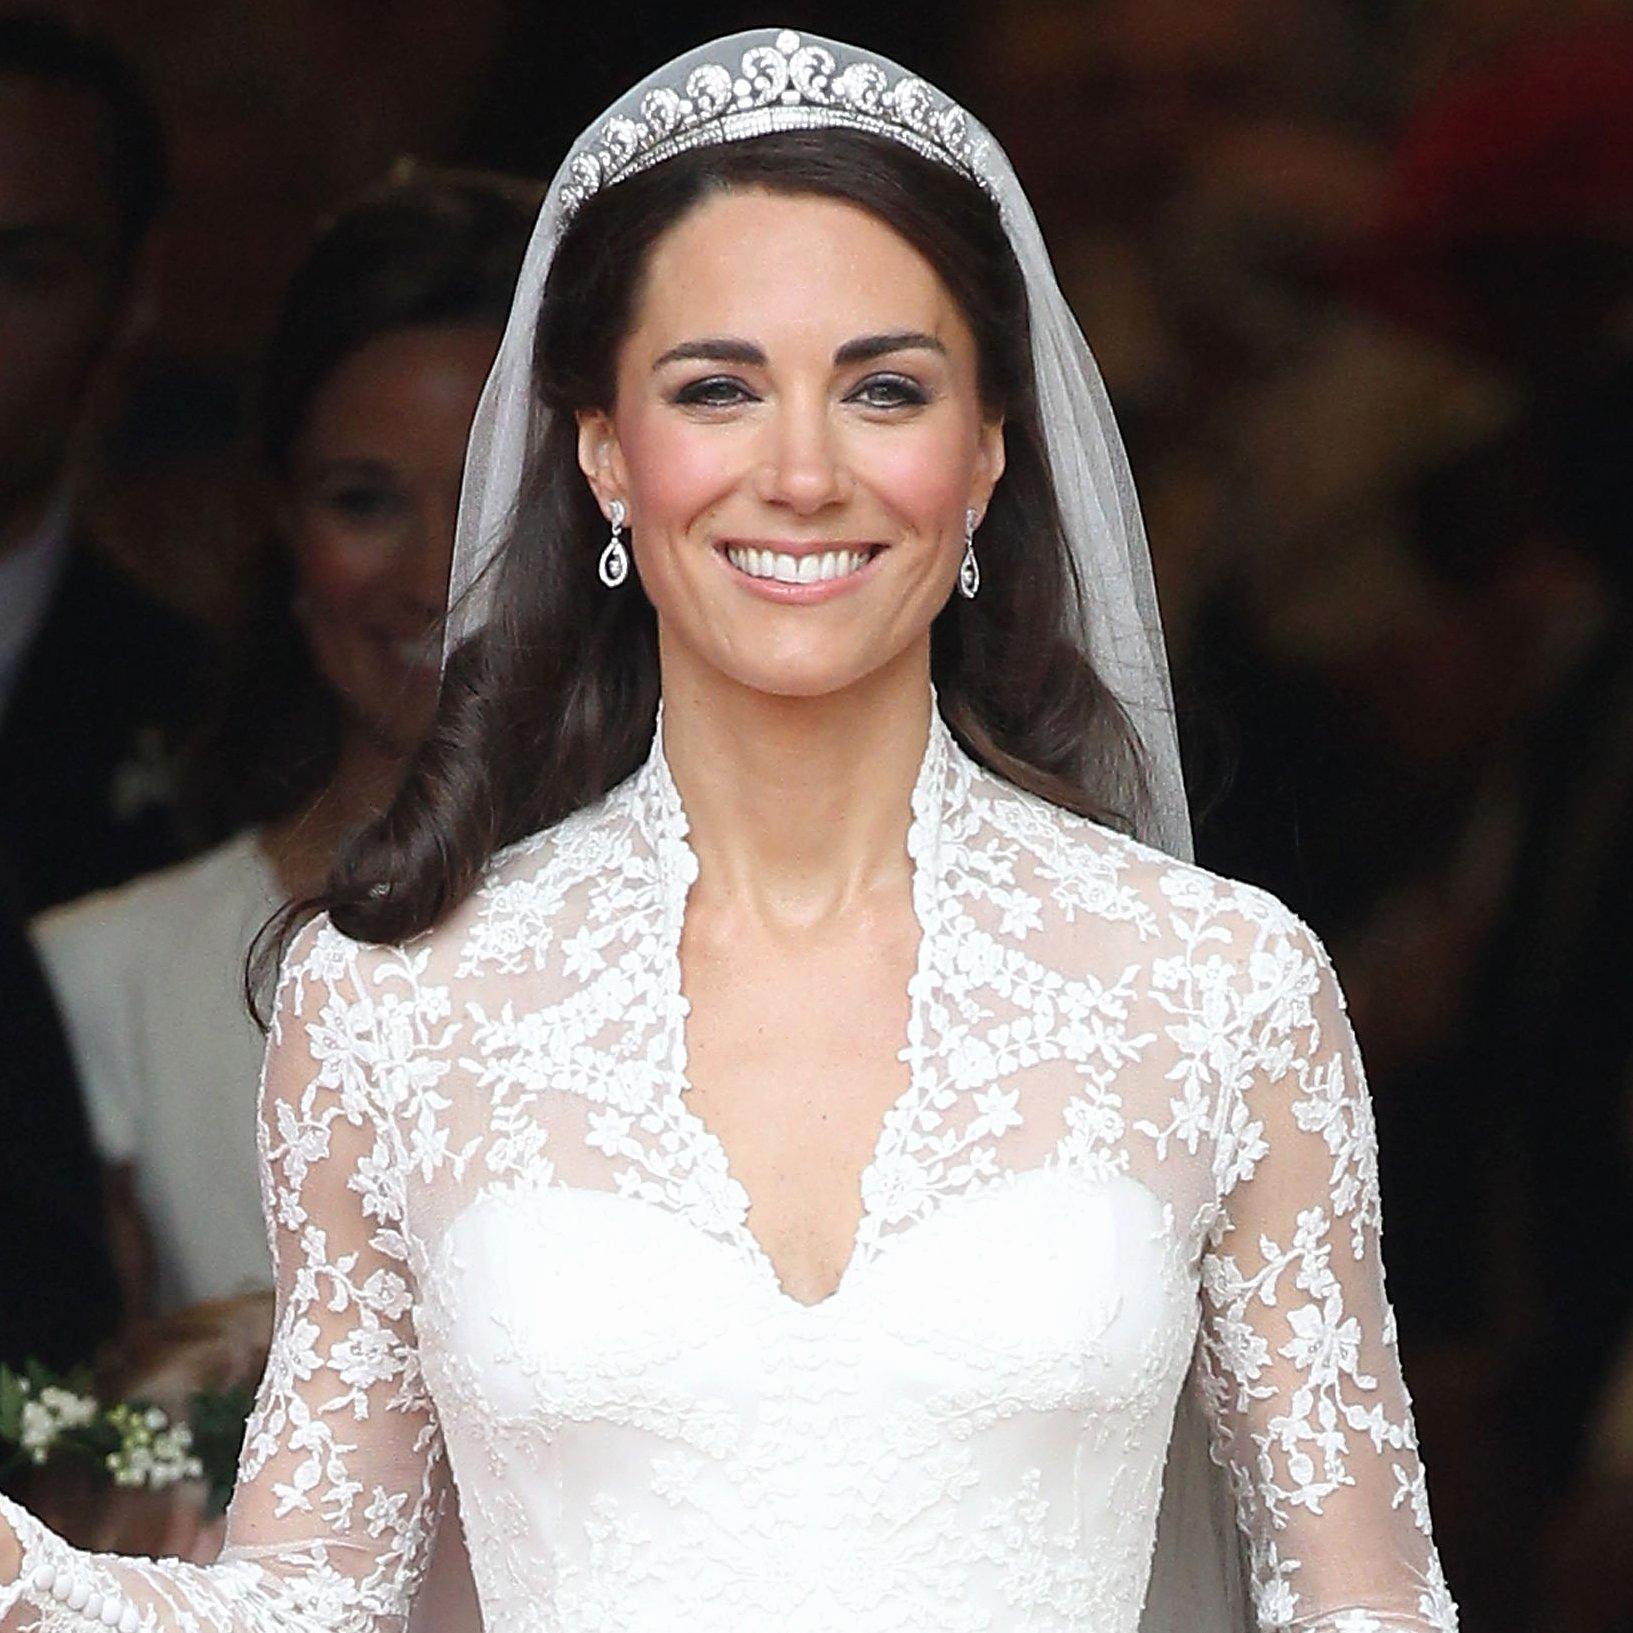 The Best Royal Bride Hairstyles   Hair Extensions Blog   Hair ...